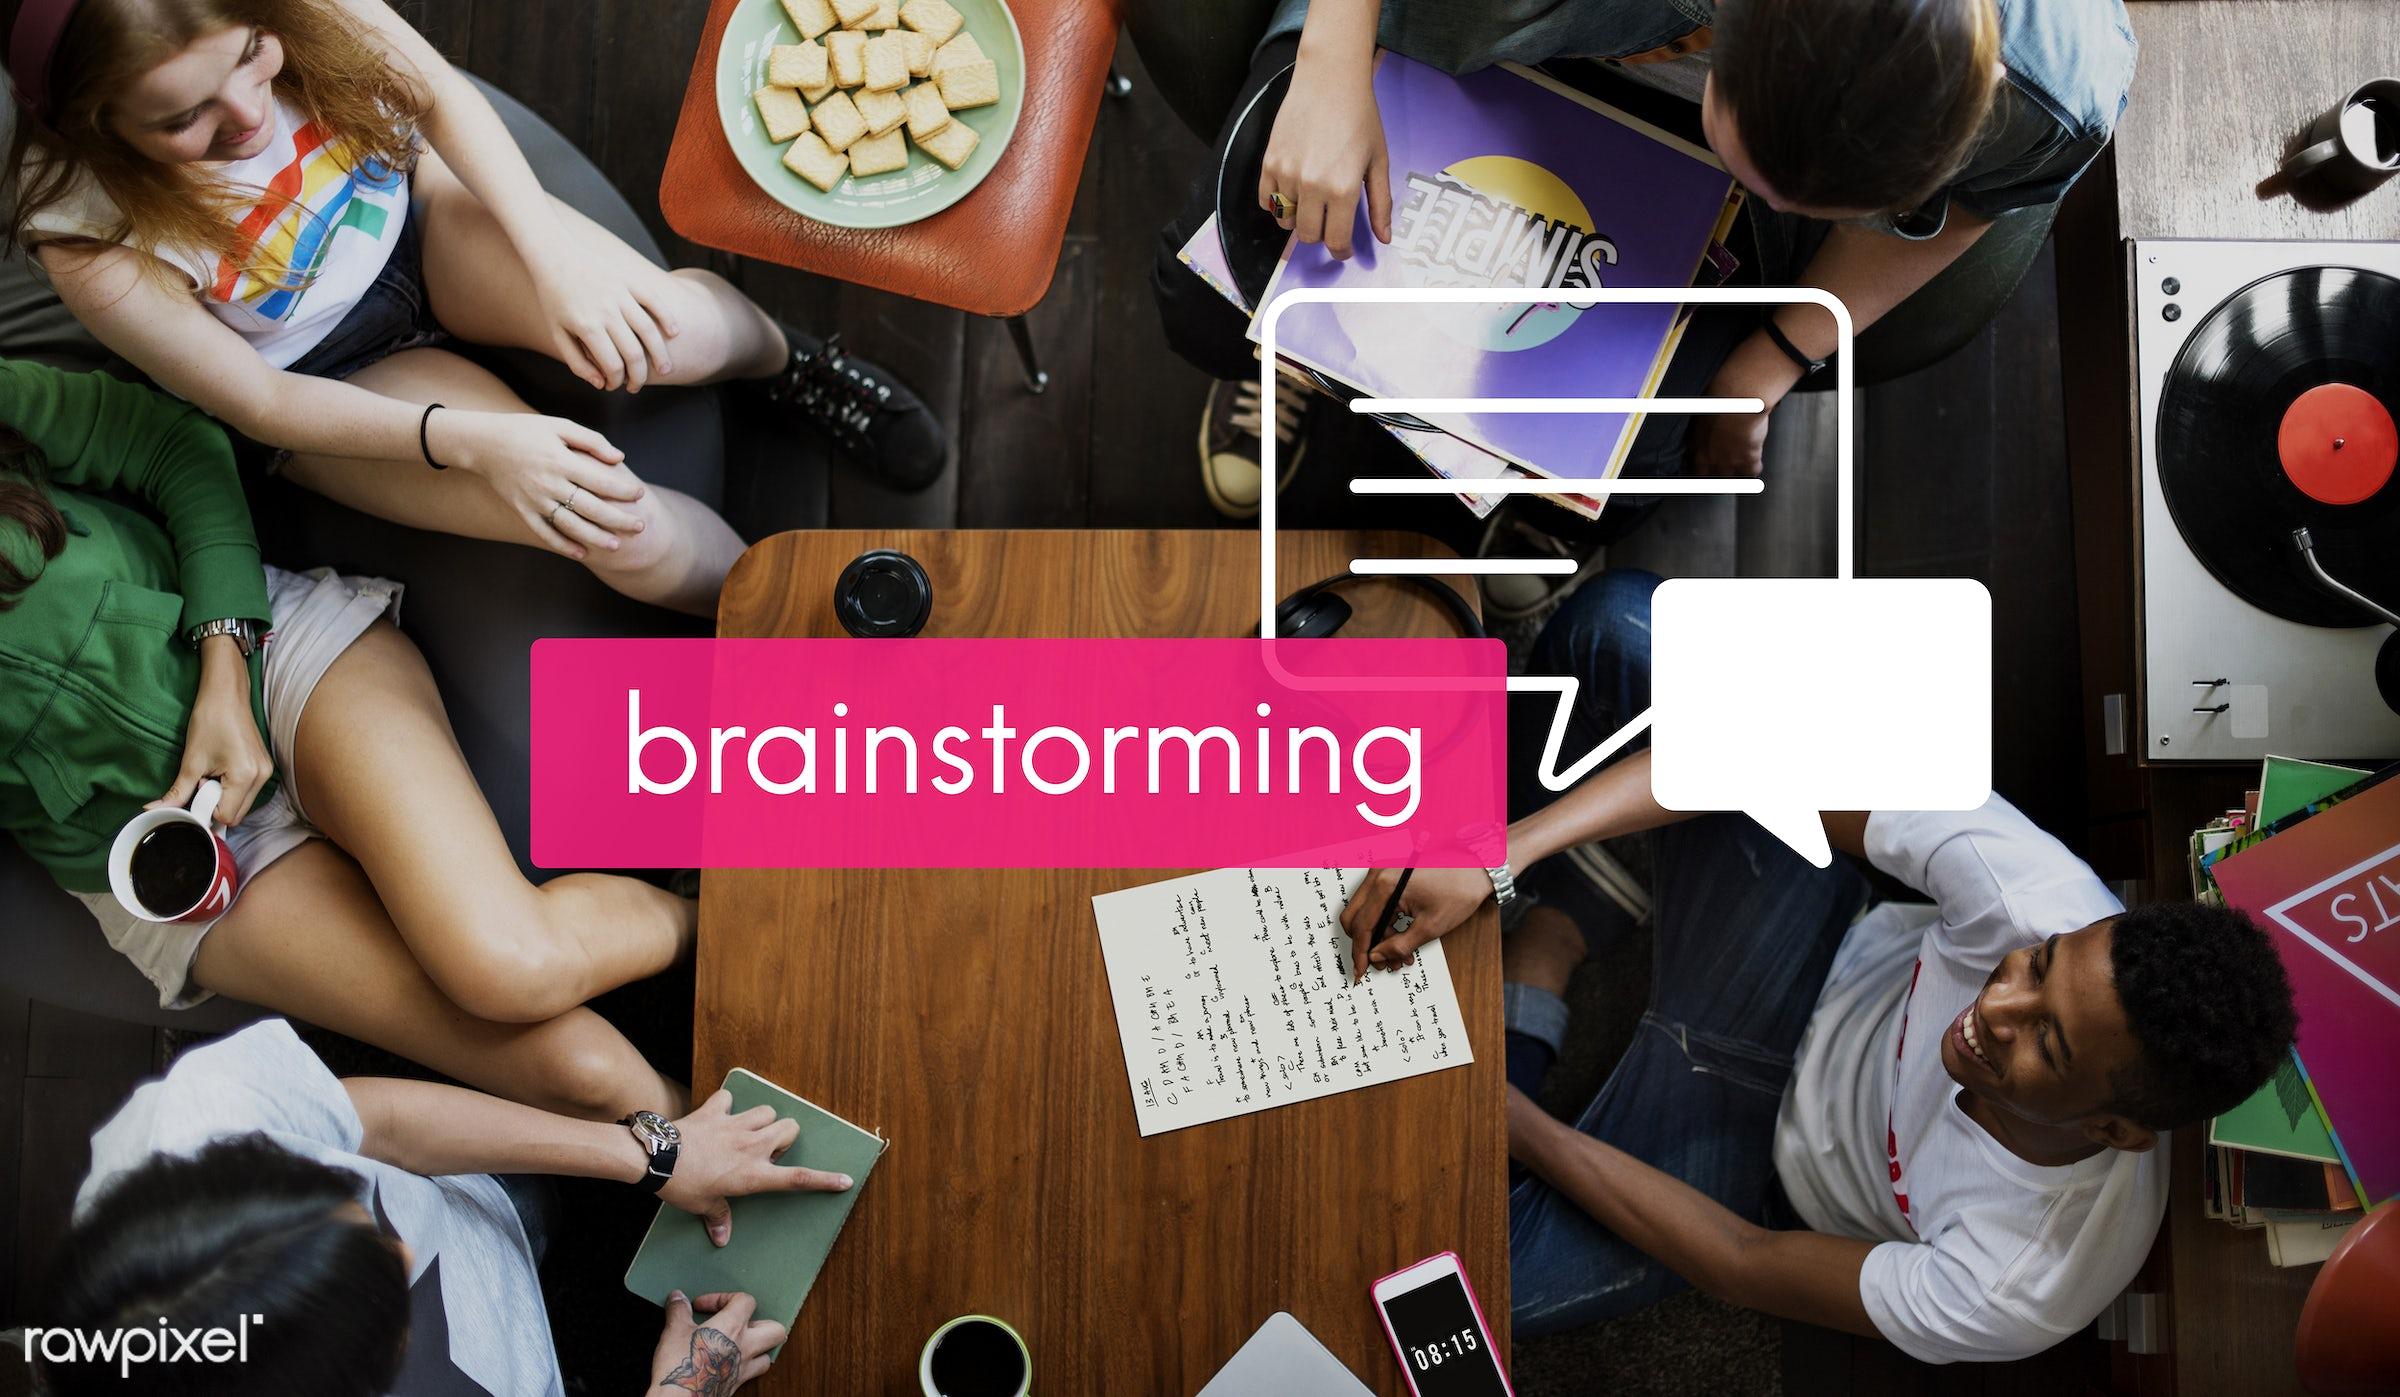 business, meeting, seminar, movement, internet, friendship, youth, african descent, asian, brainstorming, caucasian,...